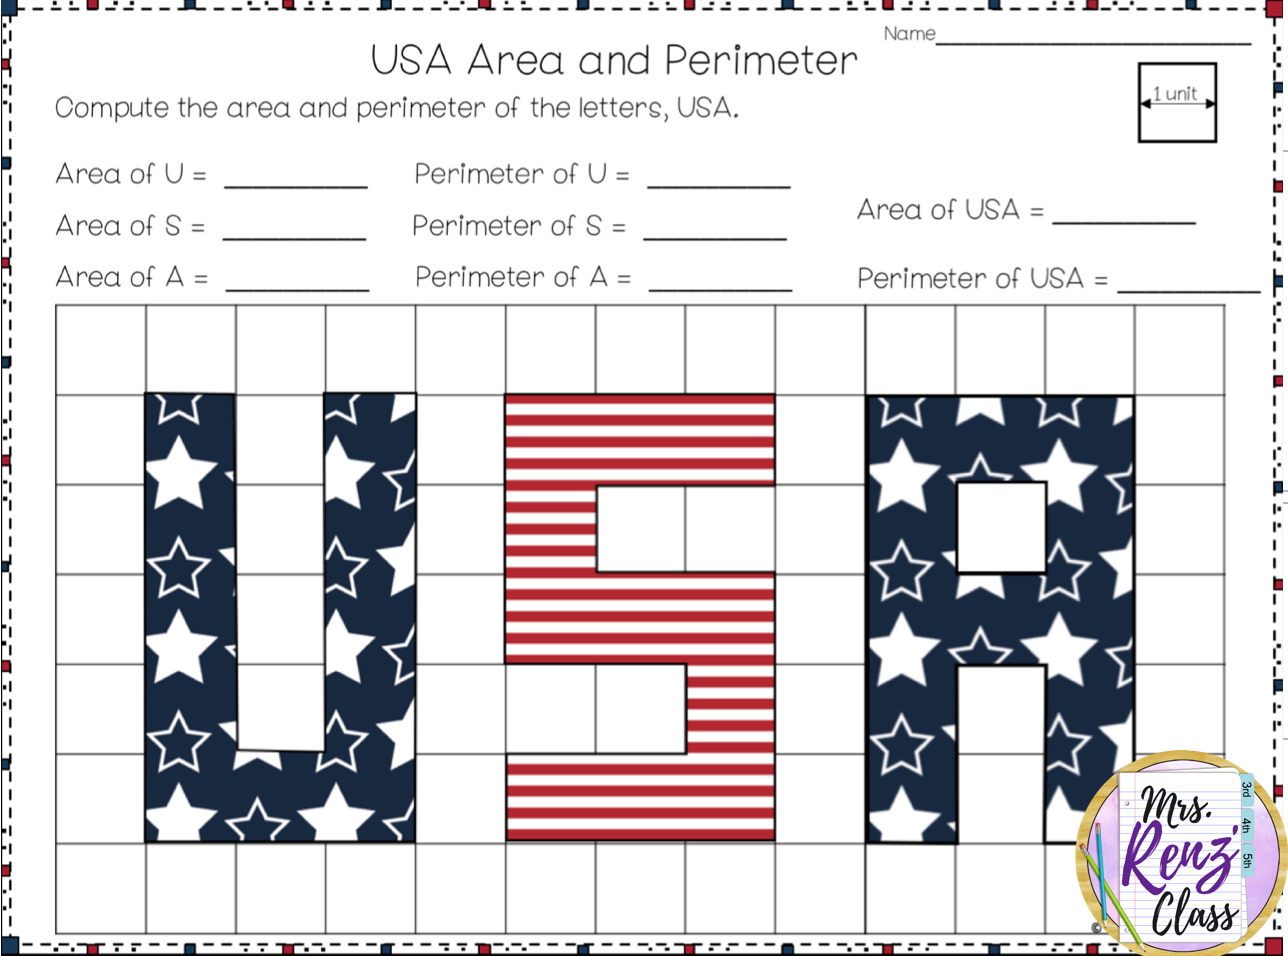 Free Area And Perimeter Practice The Fun Way Mrs Renz Class Area And Perimeter Area And Perimeter Worksheets Perimeter Worksheets [ 956 x 1288 Pixel ]